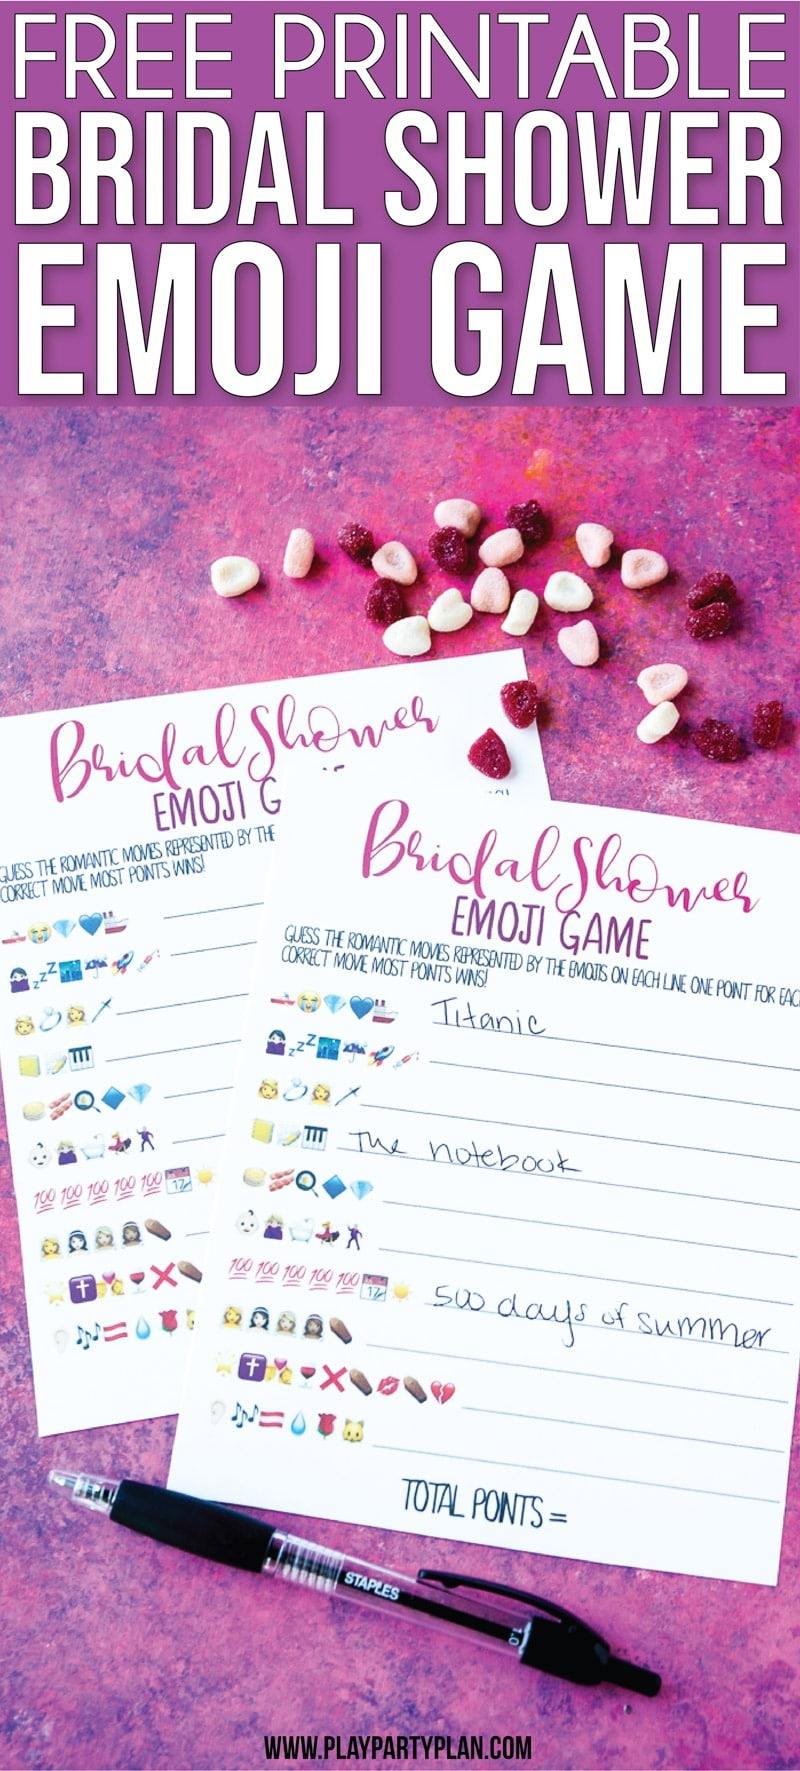 Free Printable Bridal Shower Name The Emoji Game - Free Printable Household Shower Games